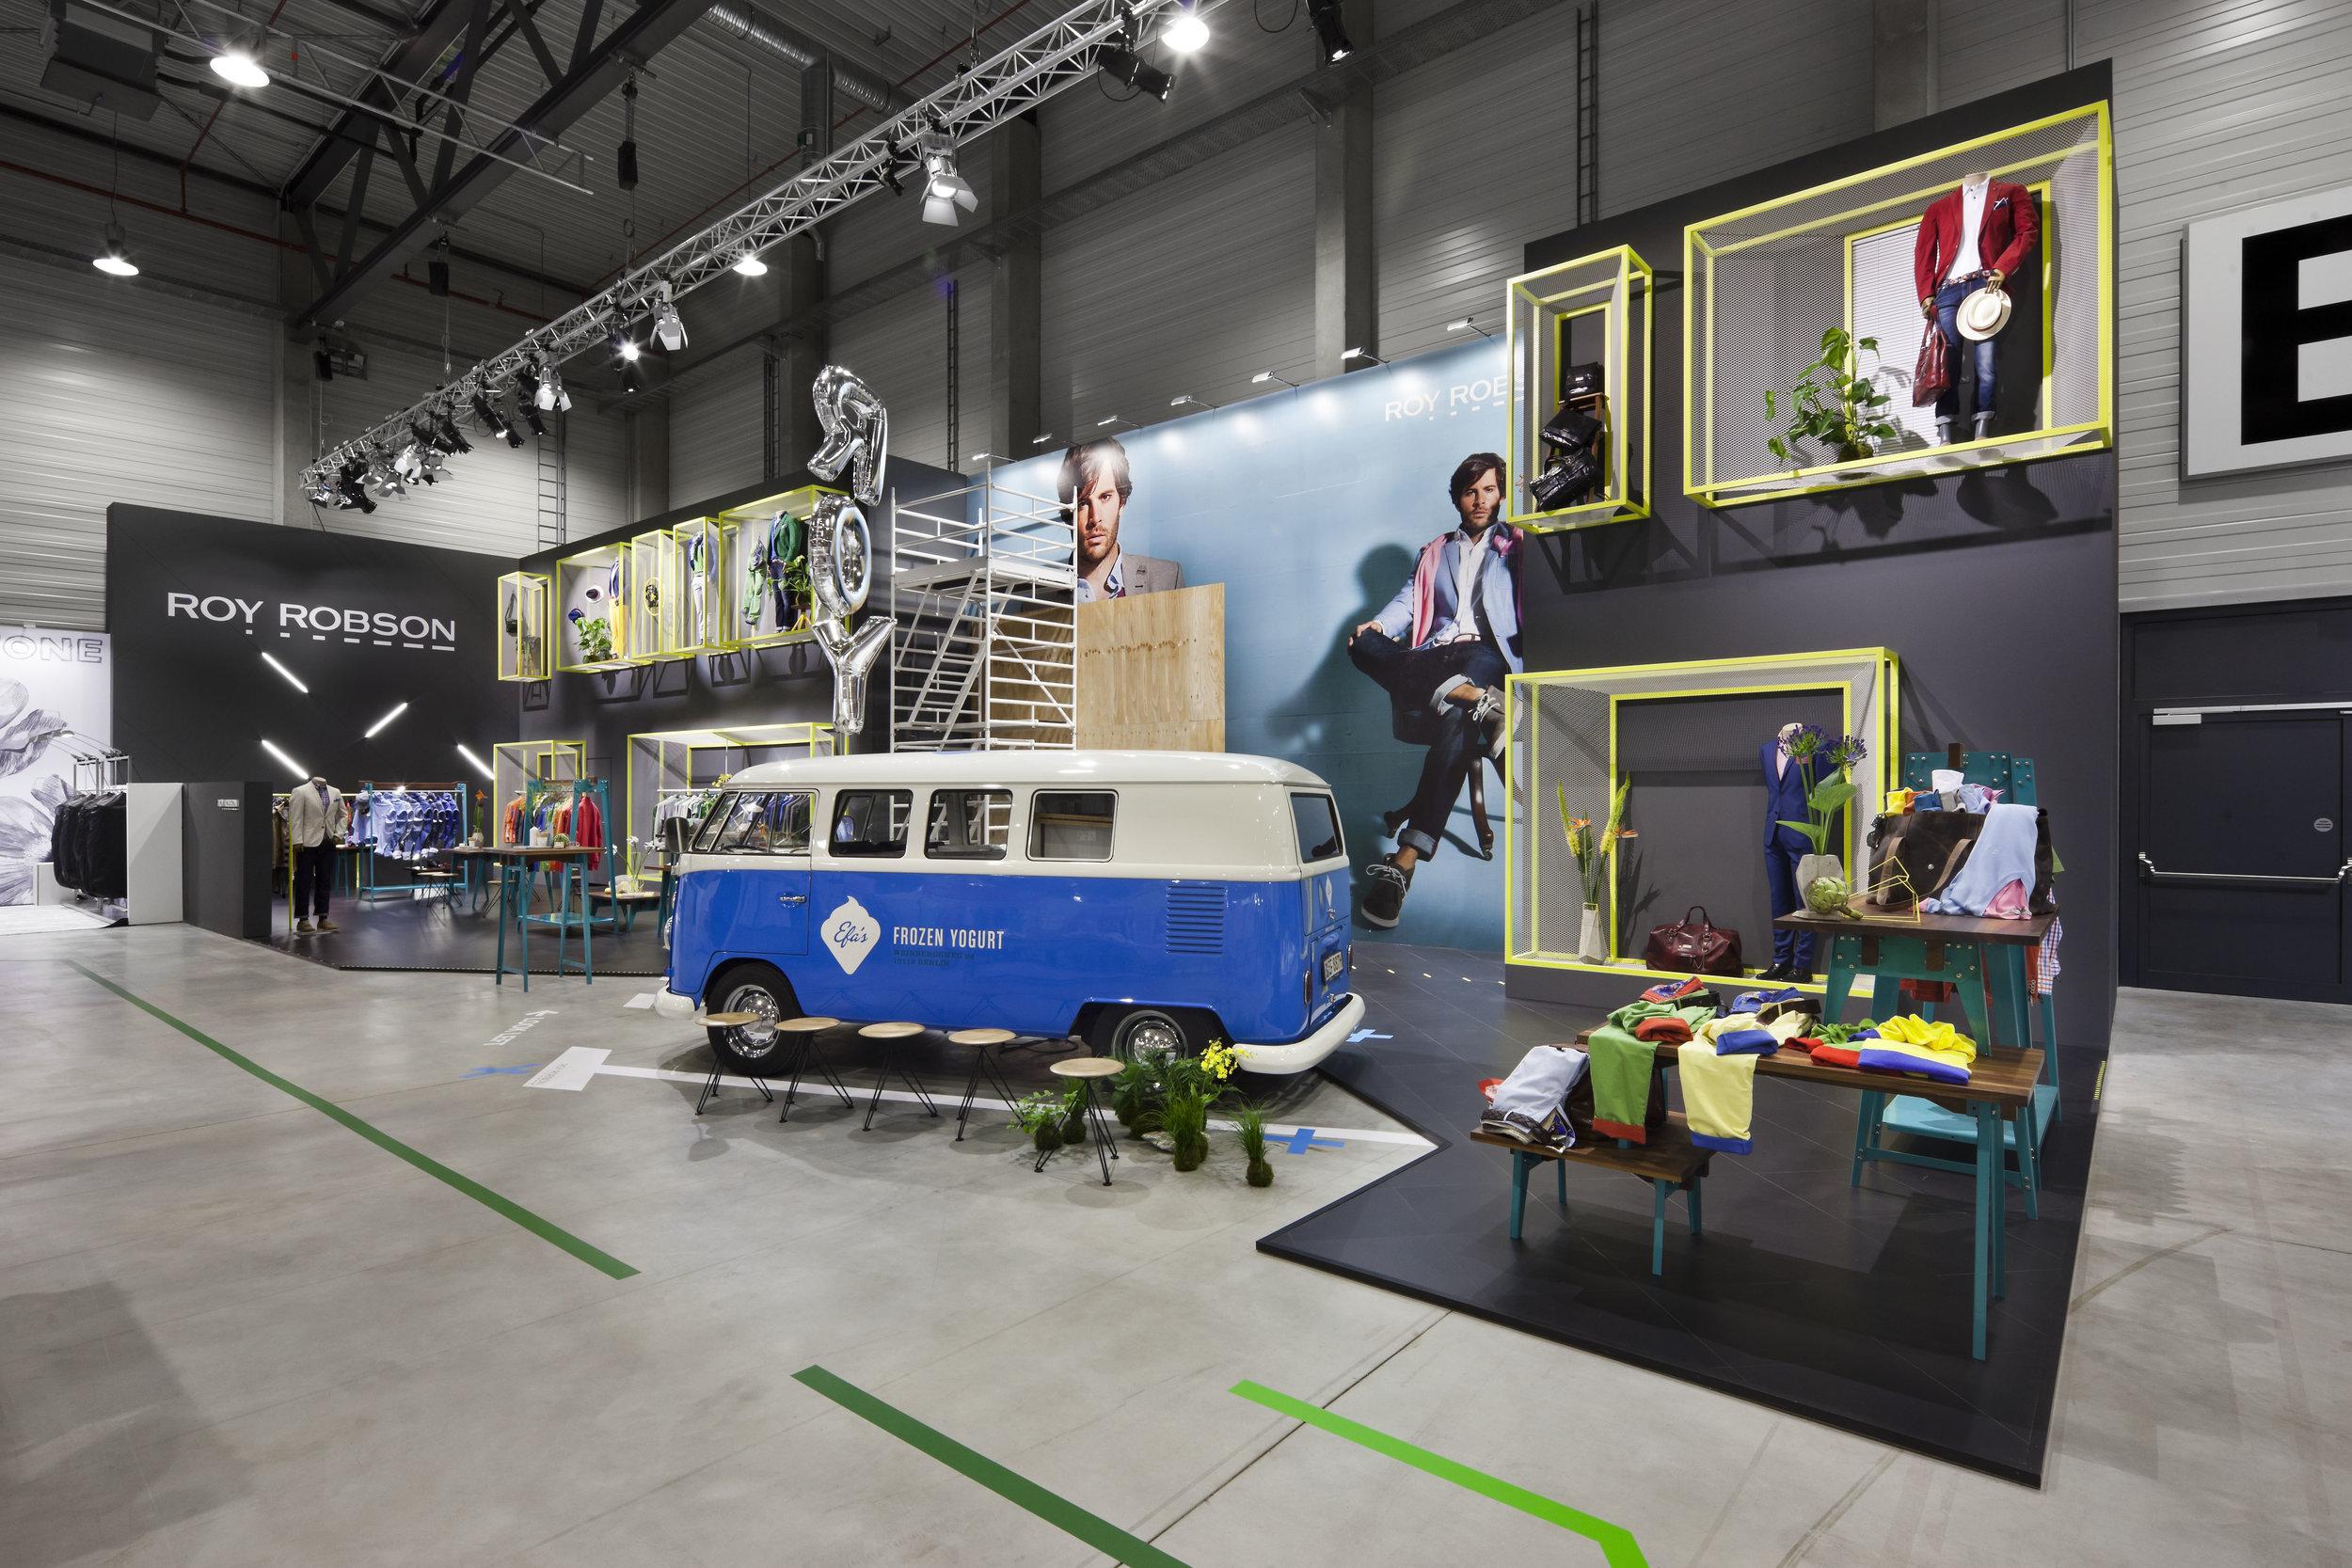 roy-robson_tradefair-exhibition-design_coordination-berlin_01.jpg